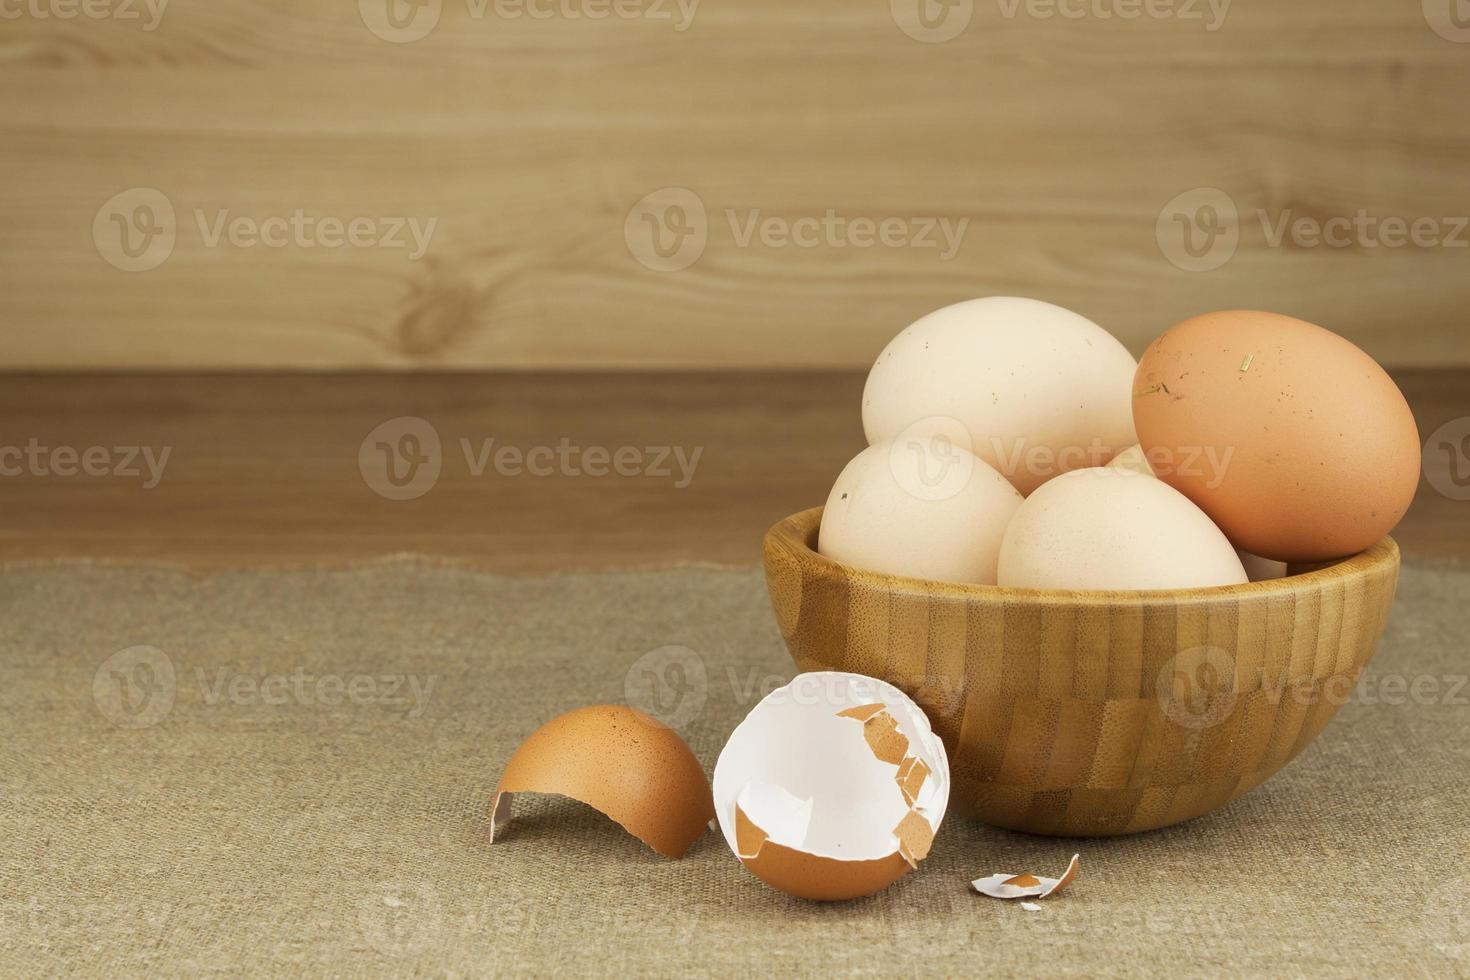 zelfgemaakte kippeneieren. foto